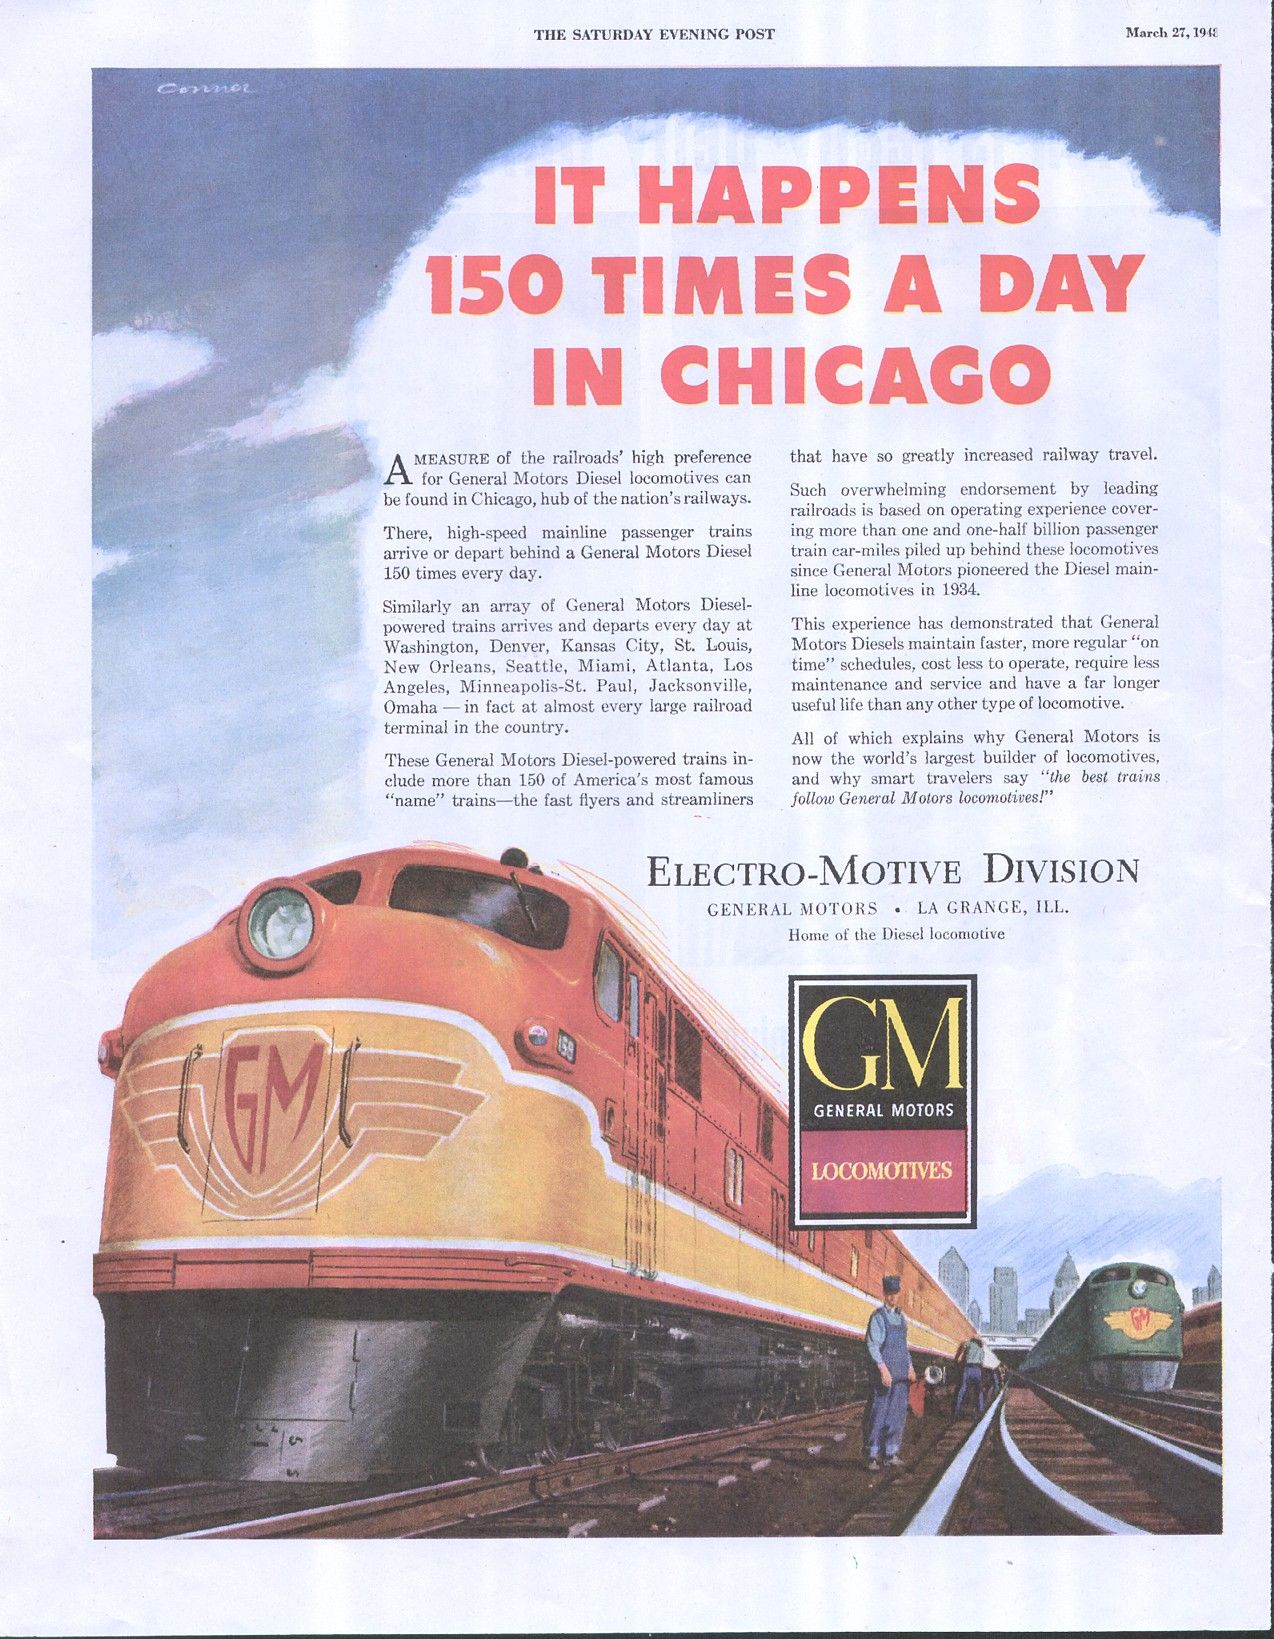 Vintage mid century train ad electro motive division gm for Electro motive division of general motors